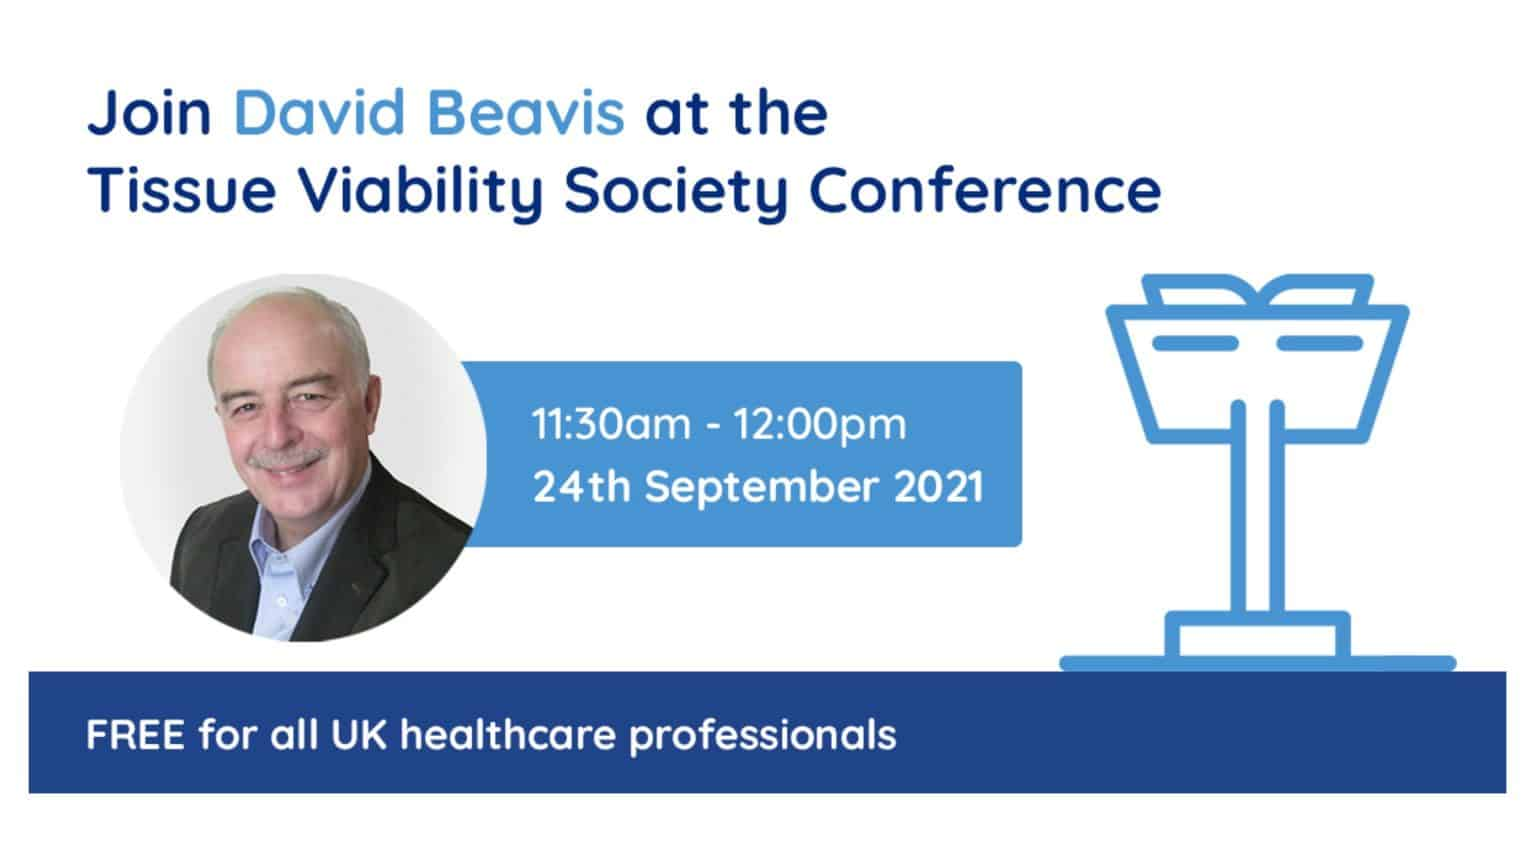 David Beavis TVS Conference 2021 image